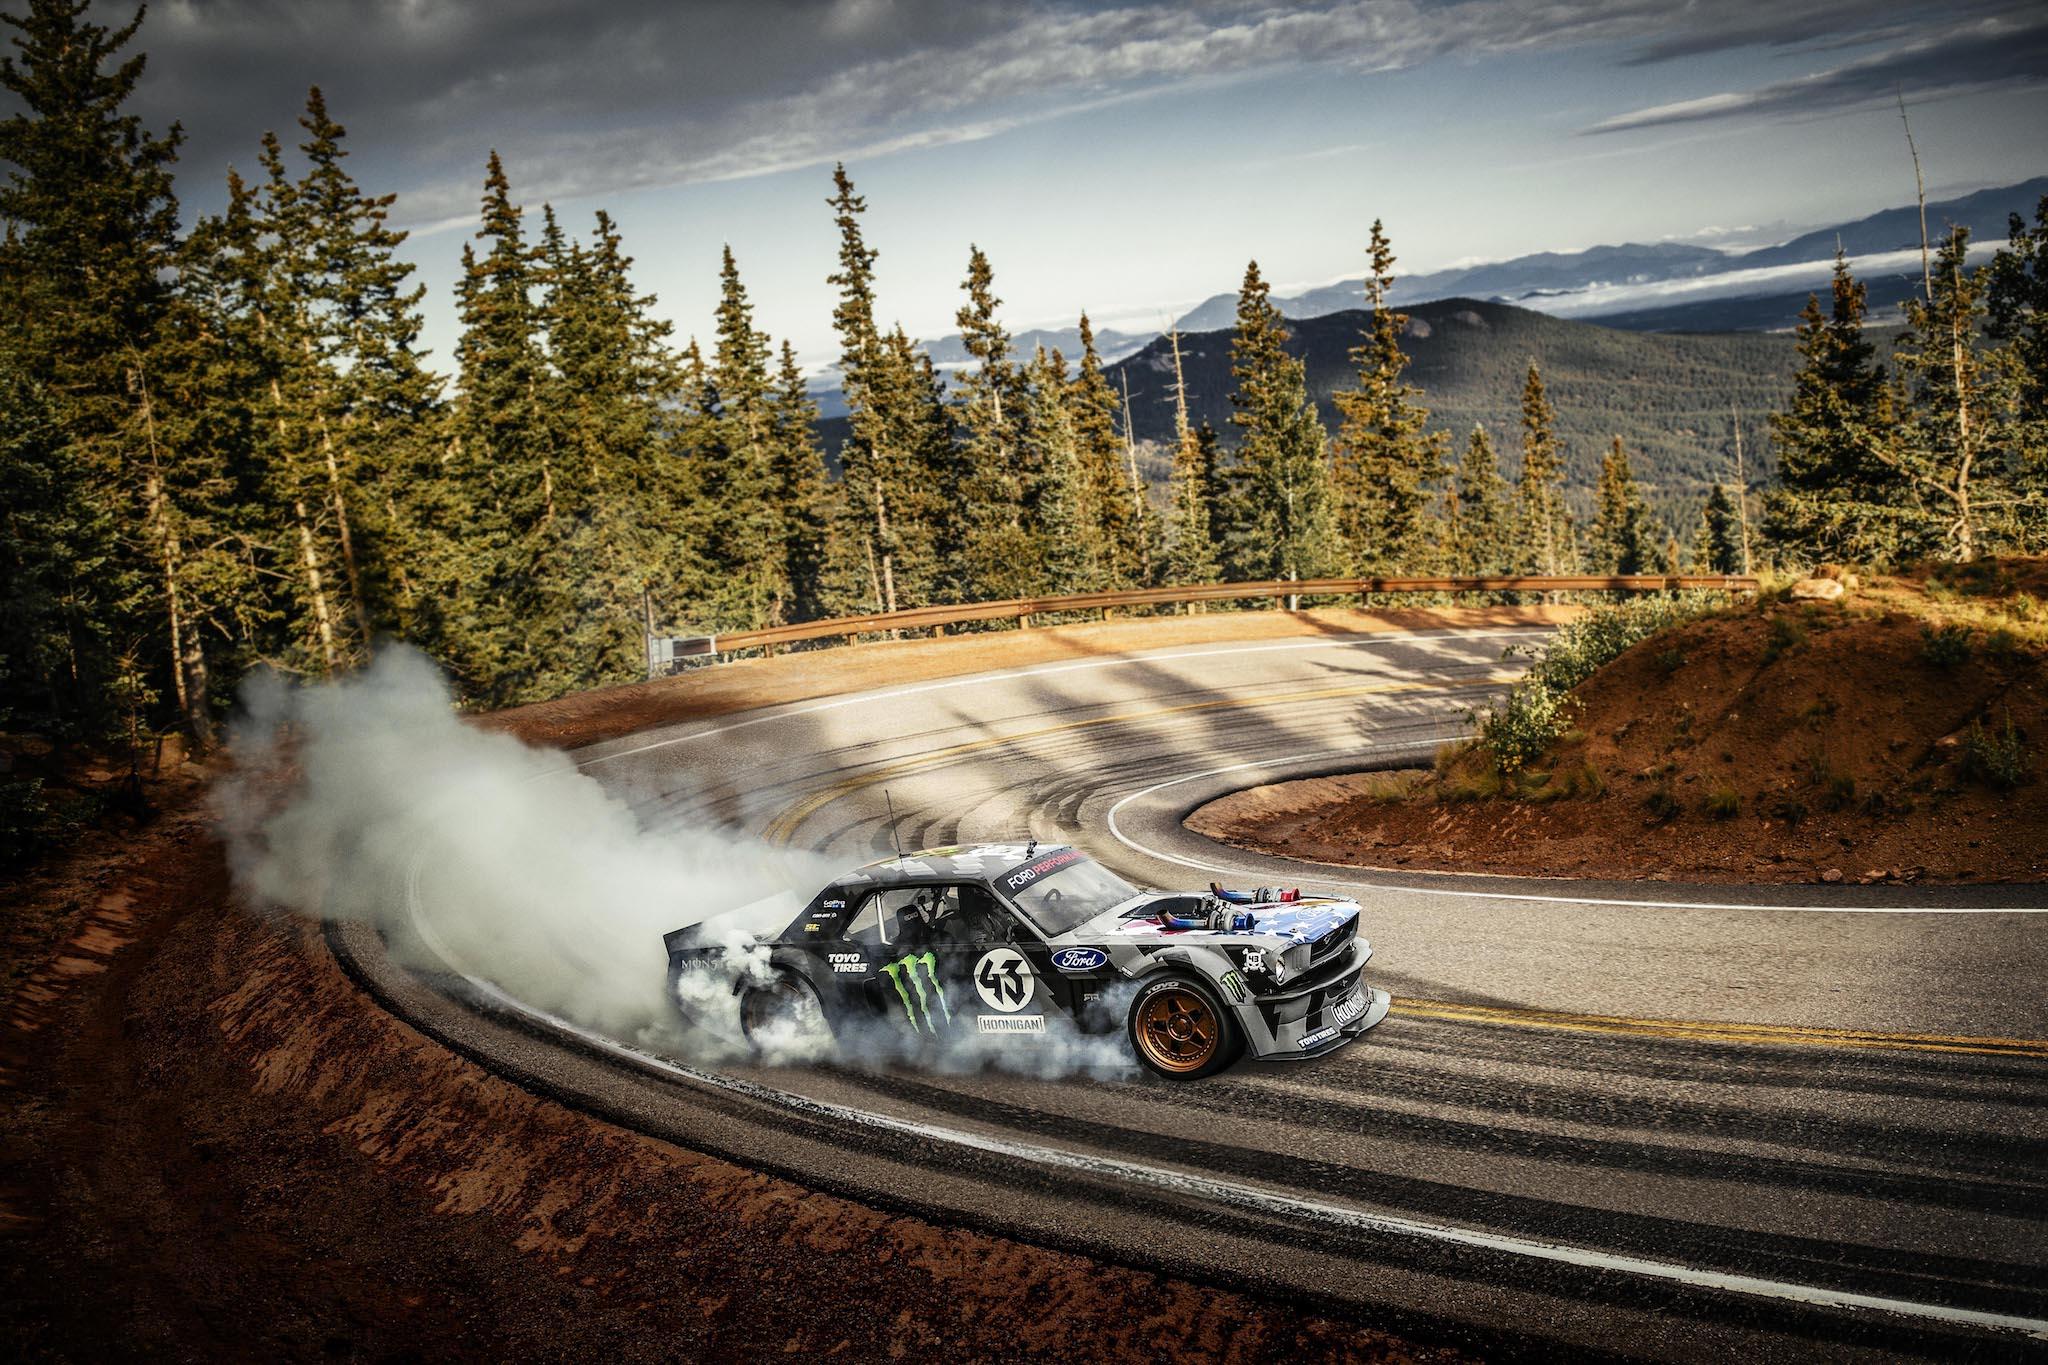 Gymkhana 7 Car Wallpaper Ken Block S Latest Insane Drifting Video Takes Place On